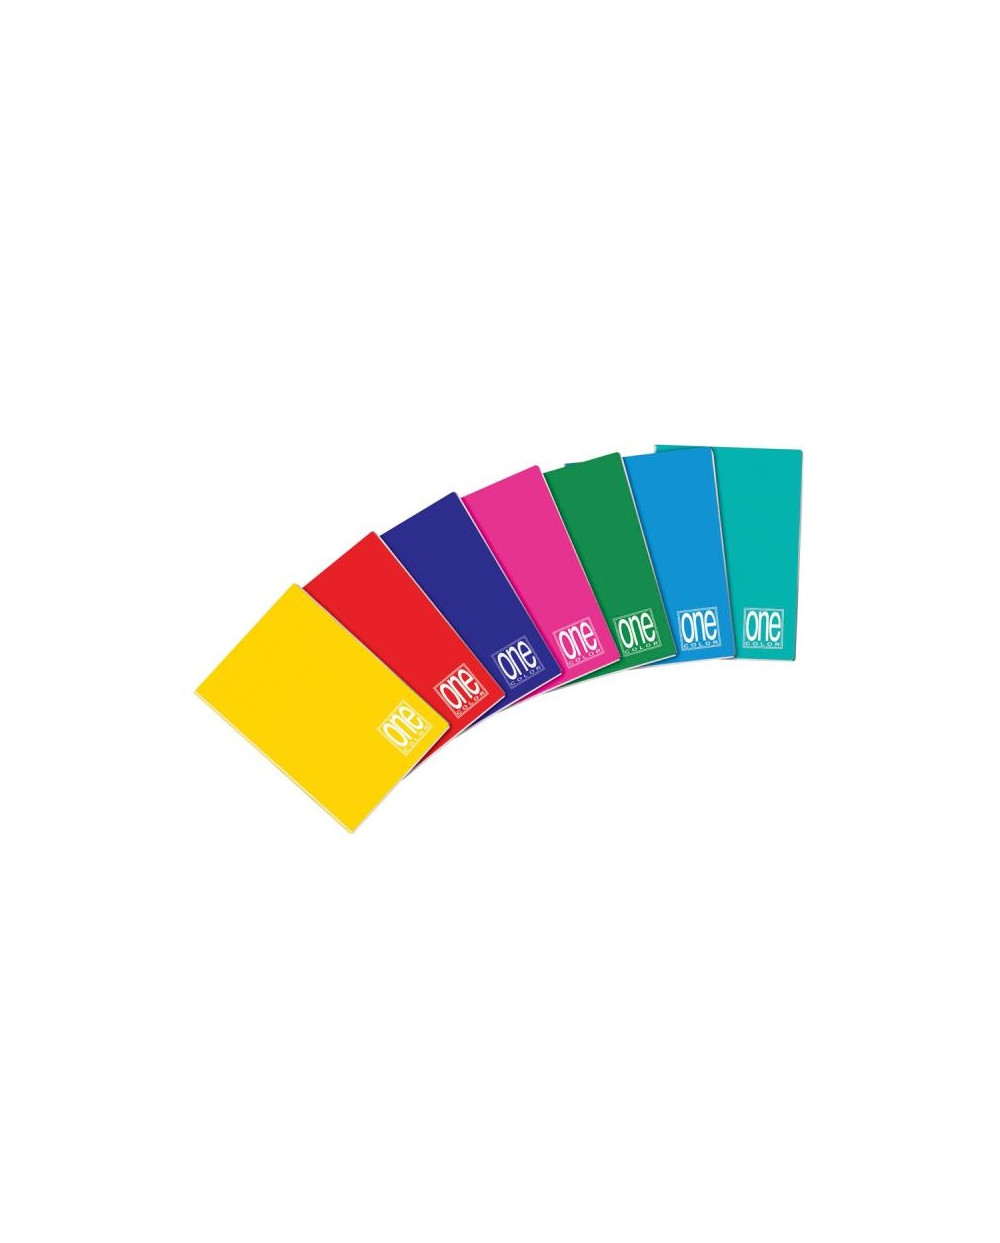 Тетрадка BLASETTI, A5 UV One Color шита, 42 л.ред, 80 г/м2